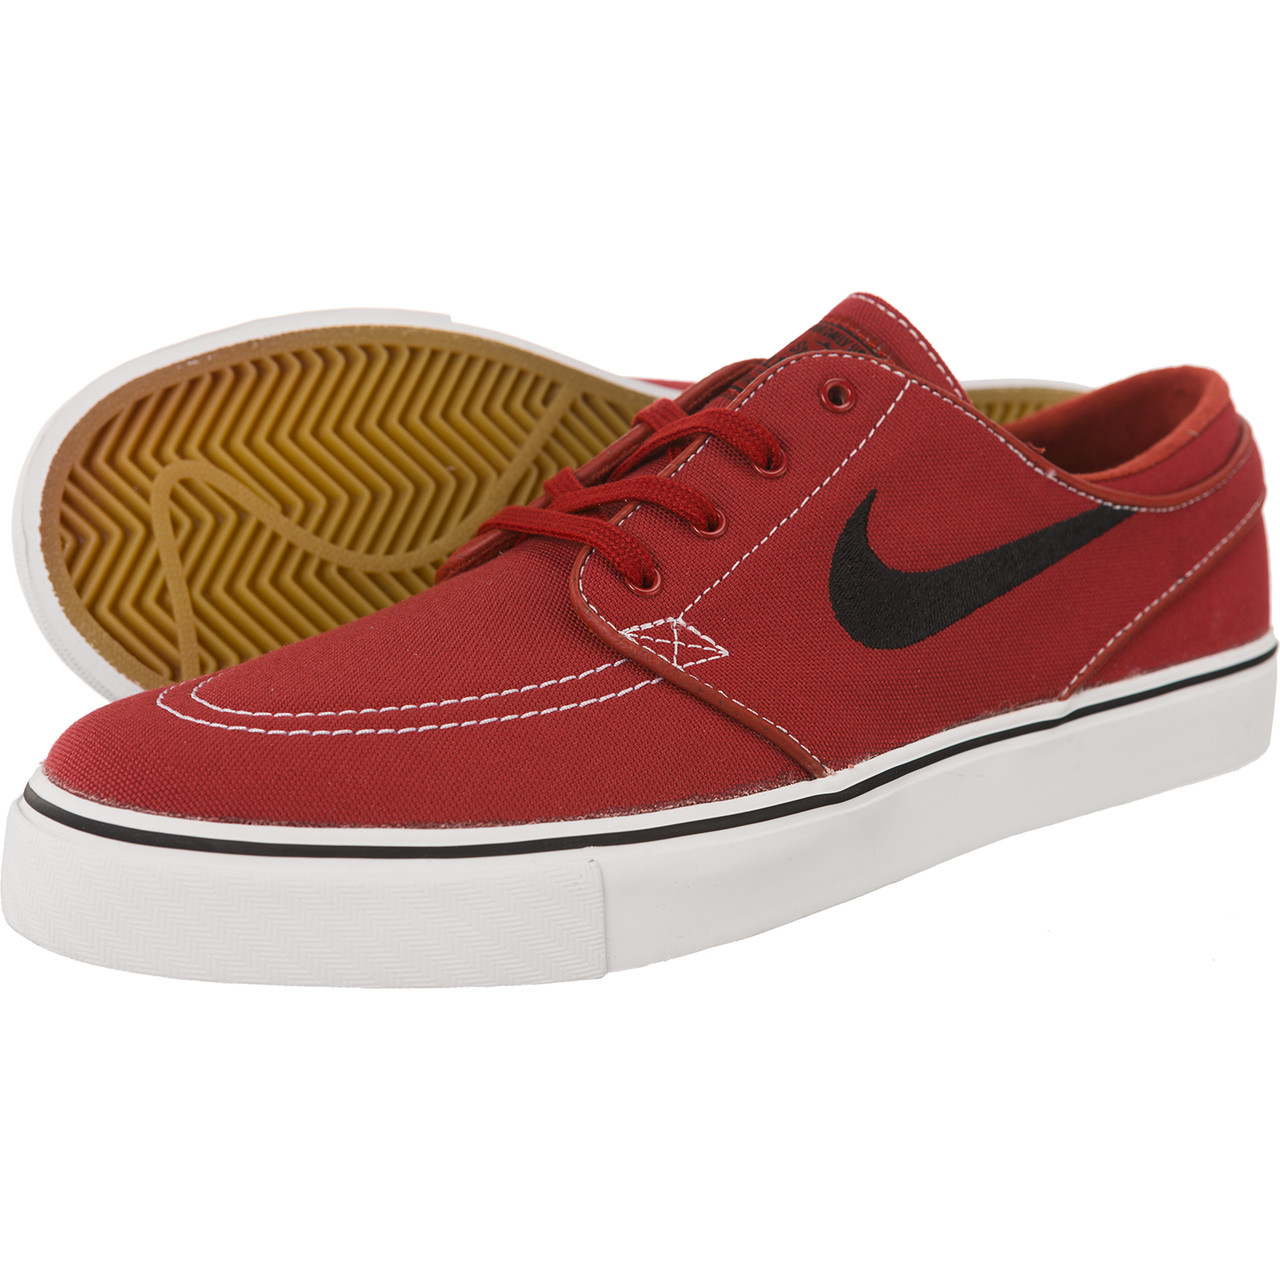 9789385128b3 Buty Nike Zoom Stefan Janoski CNVS 600 - eastend.pl